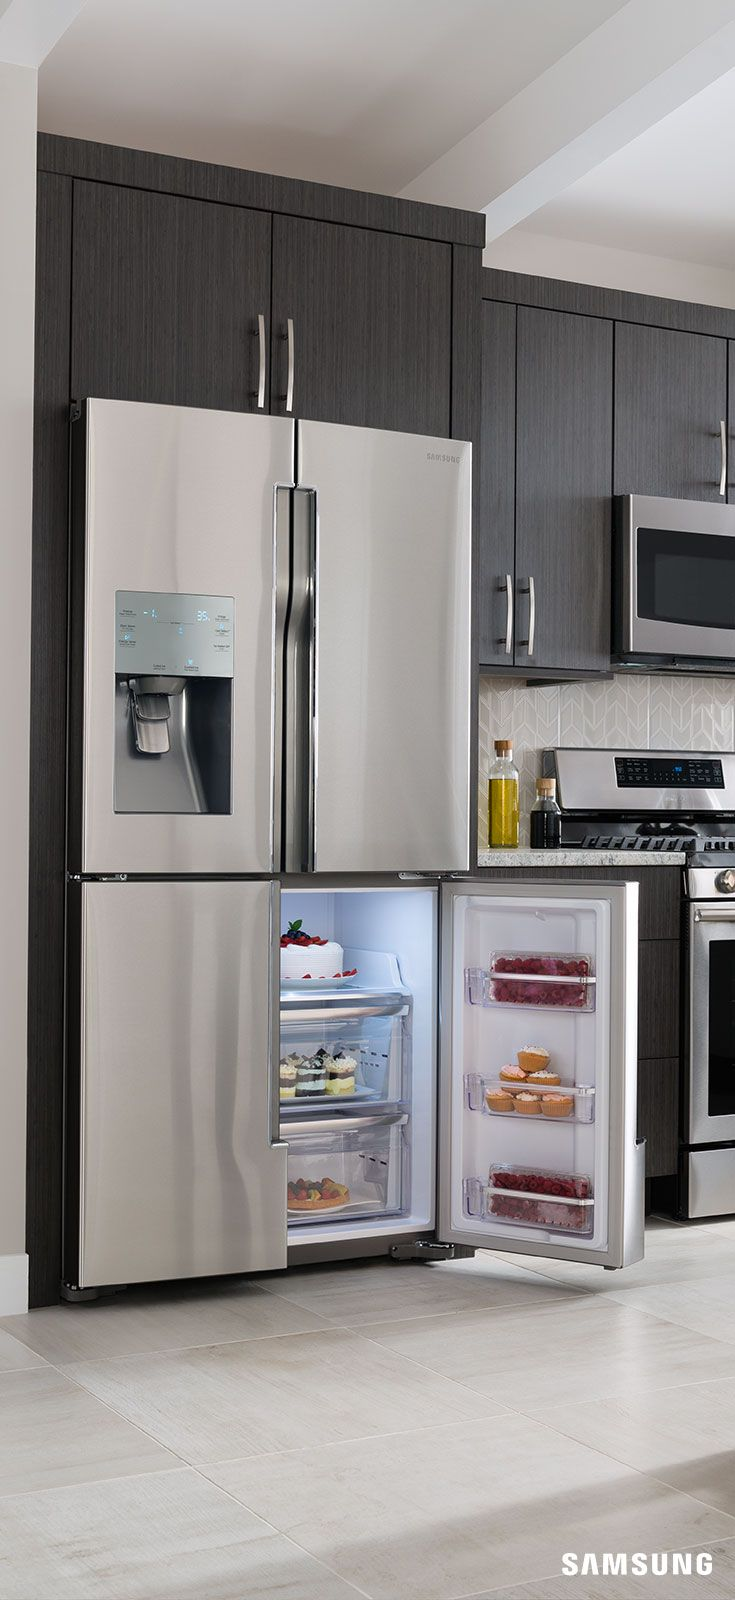 Pin on Kitchen Design Inspiration